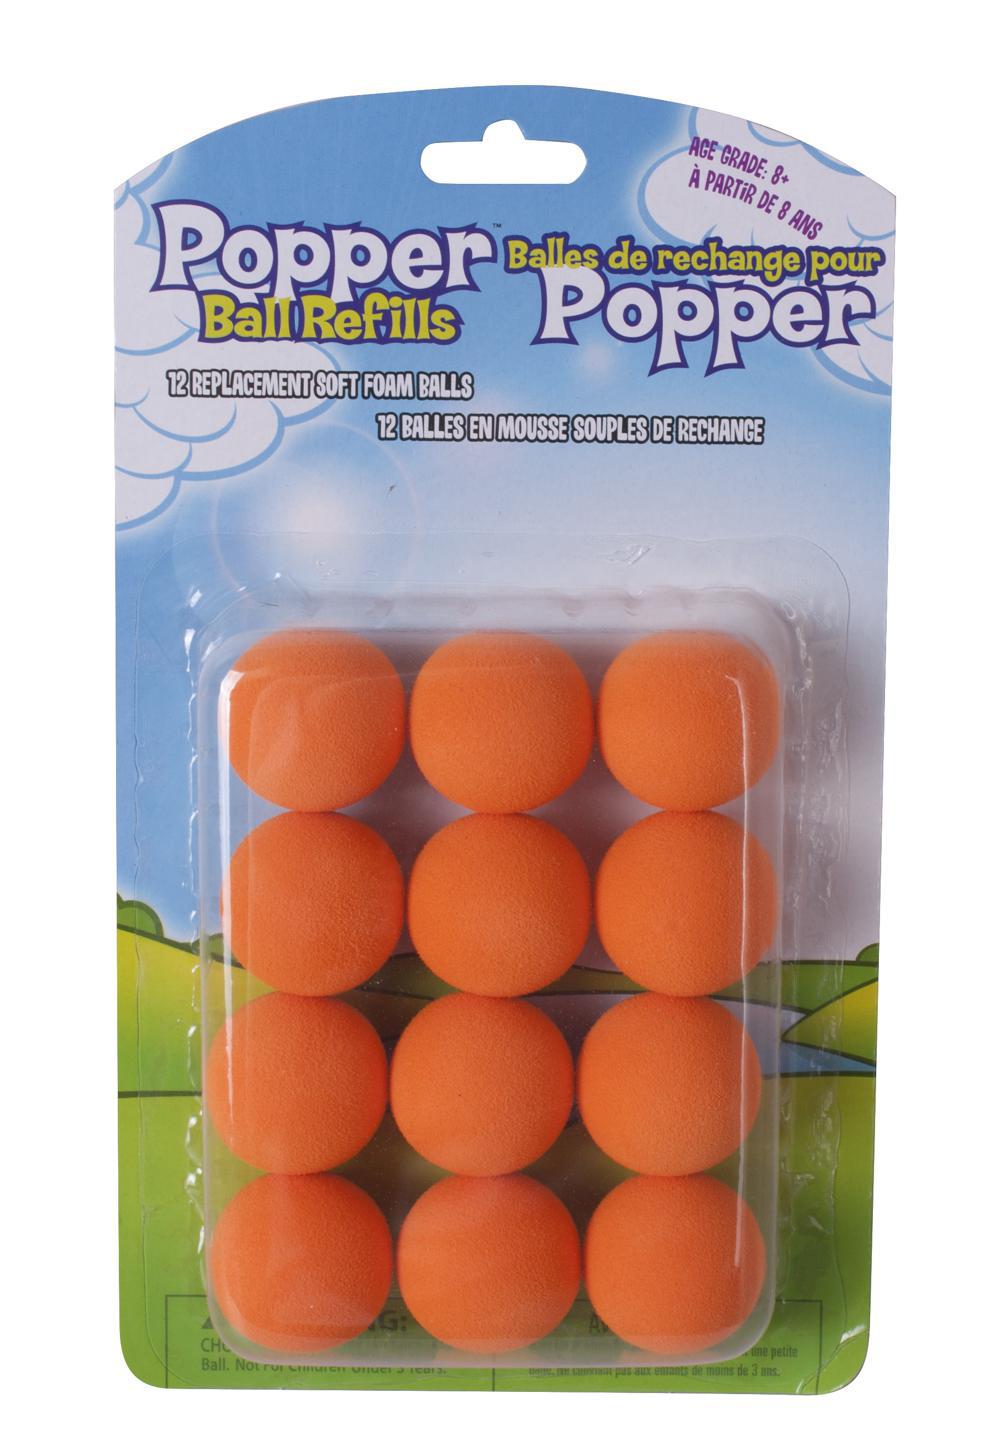 Power Popper 12 balles de recharge